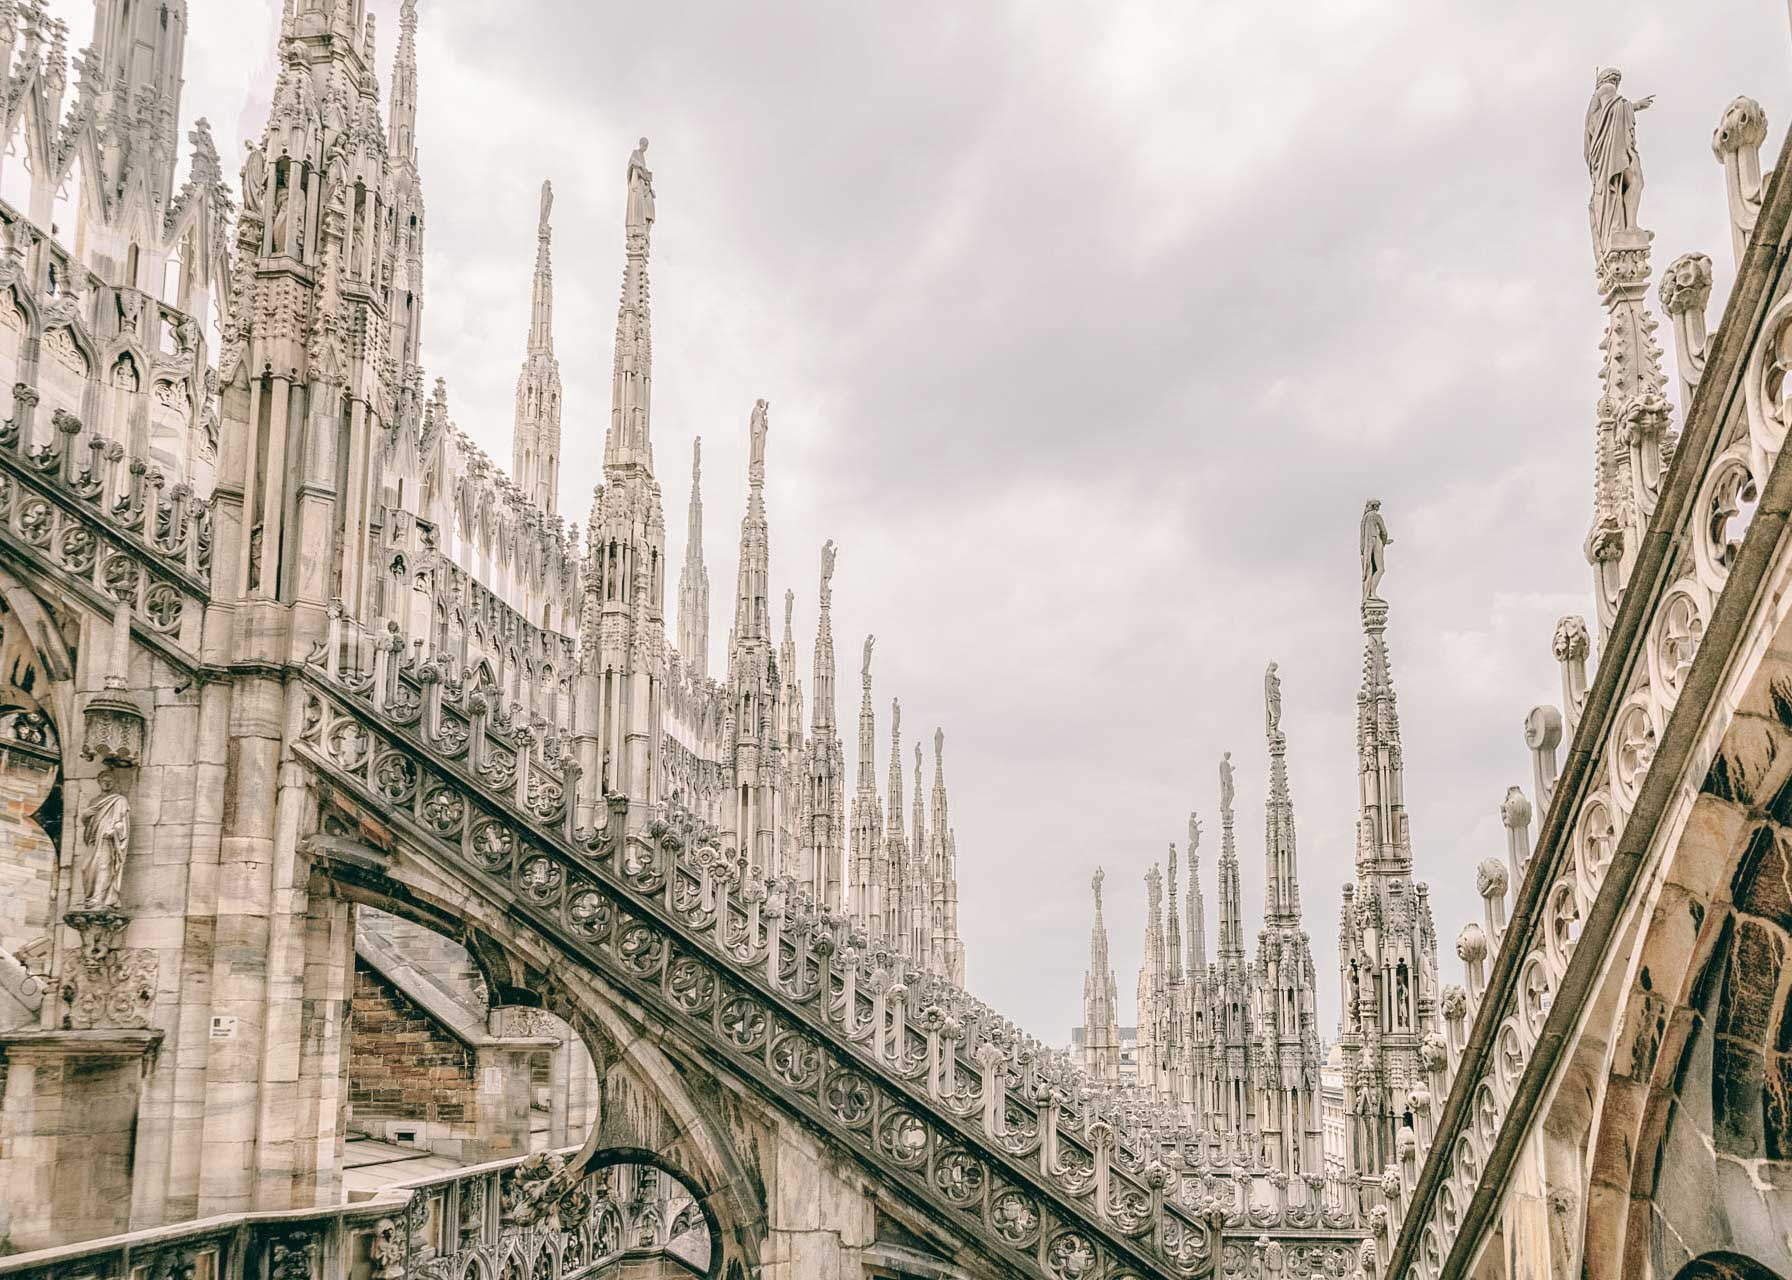 Duomo di Milano roof